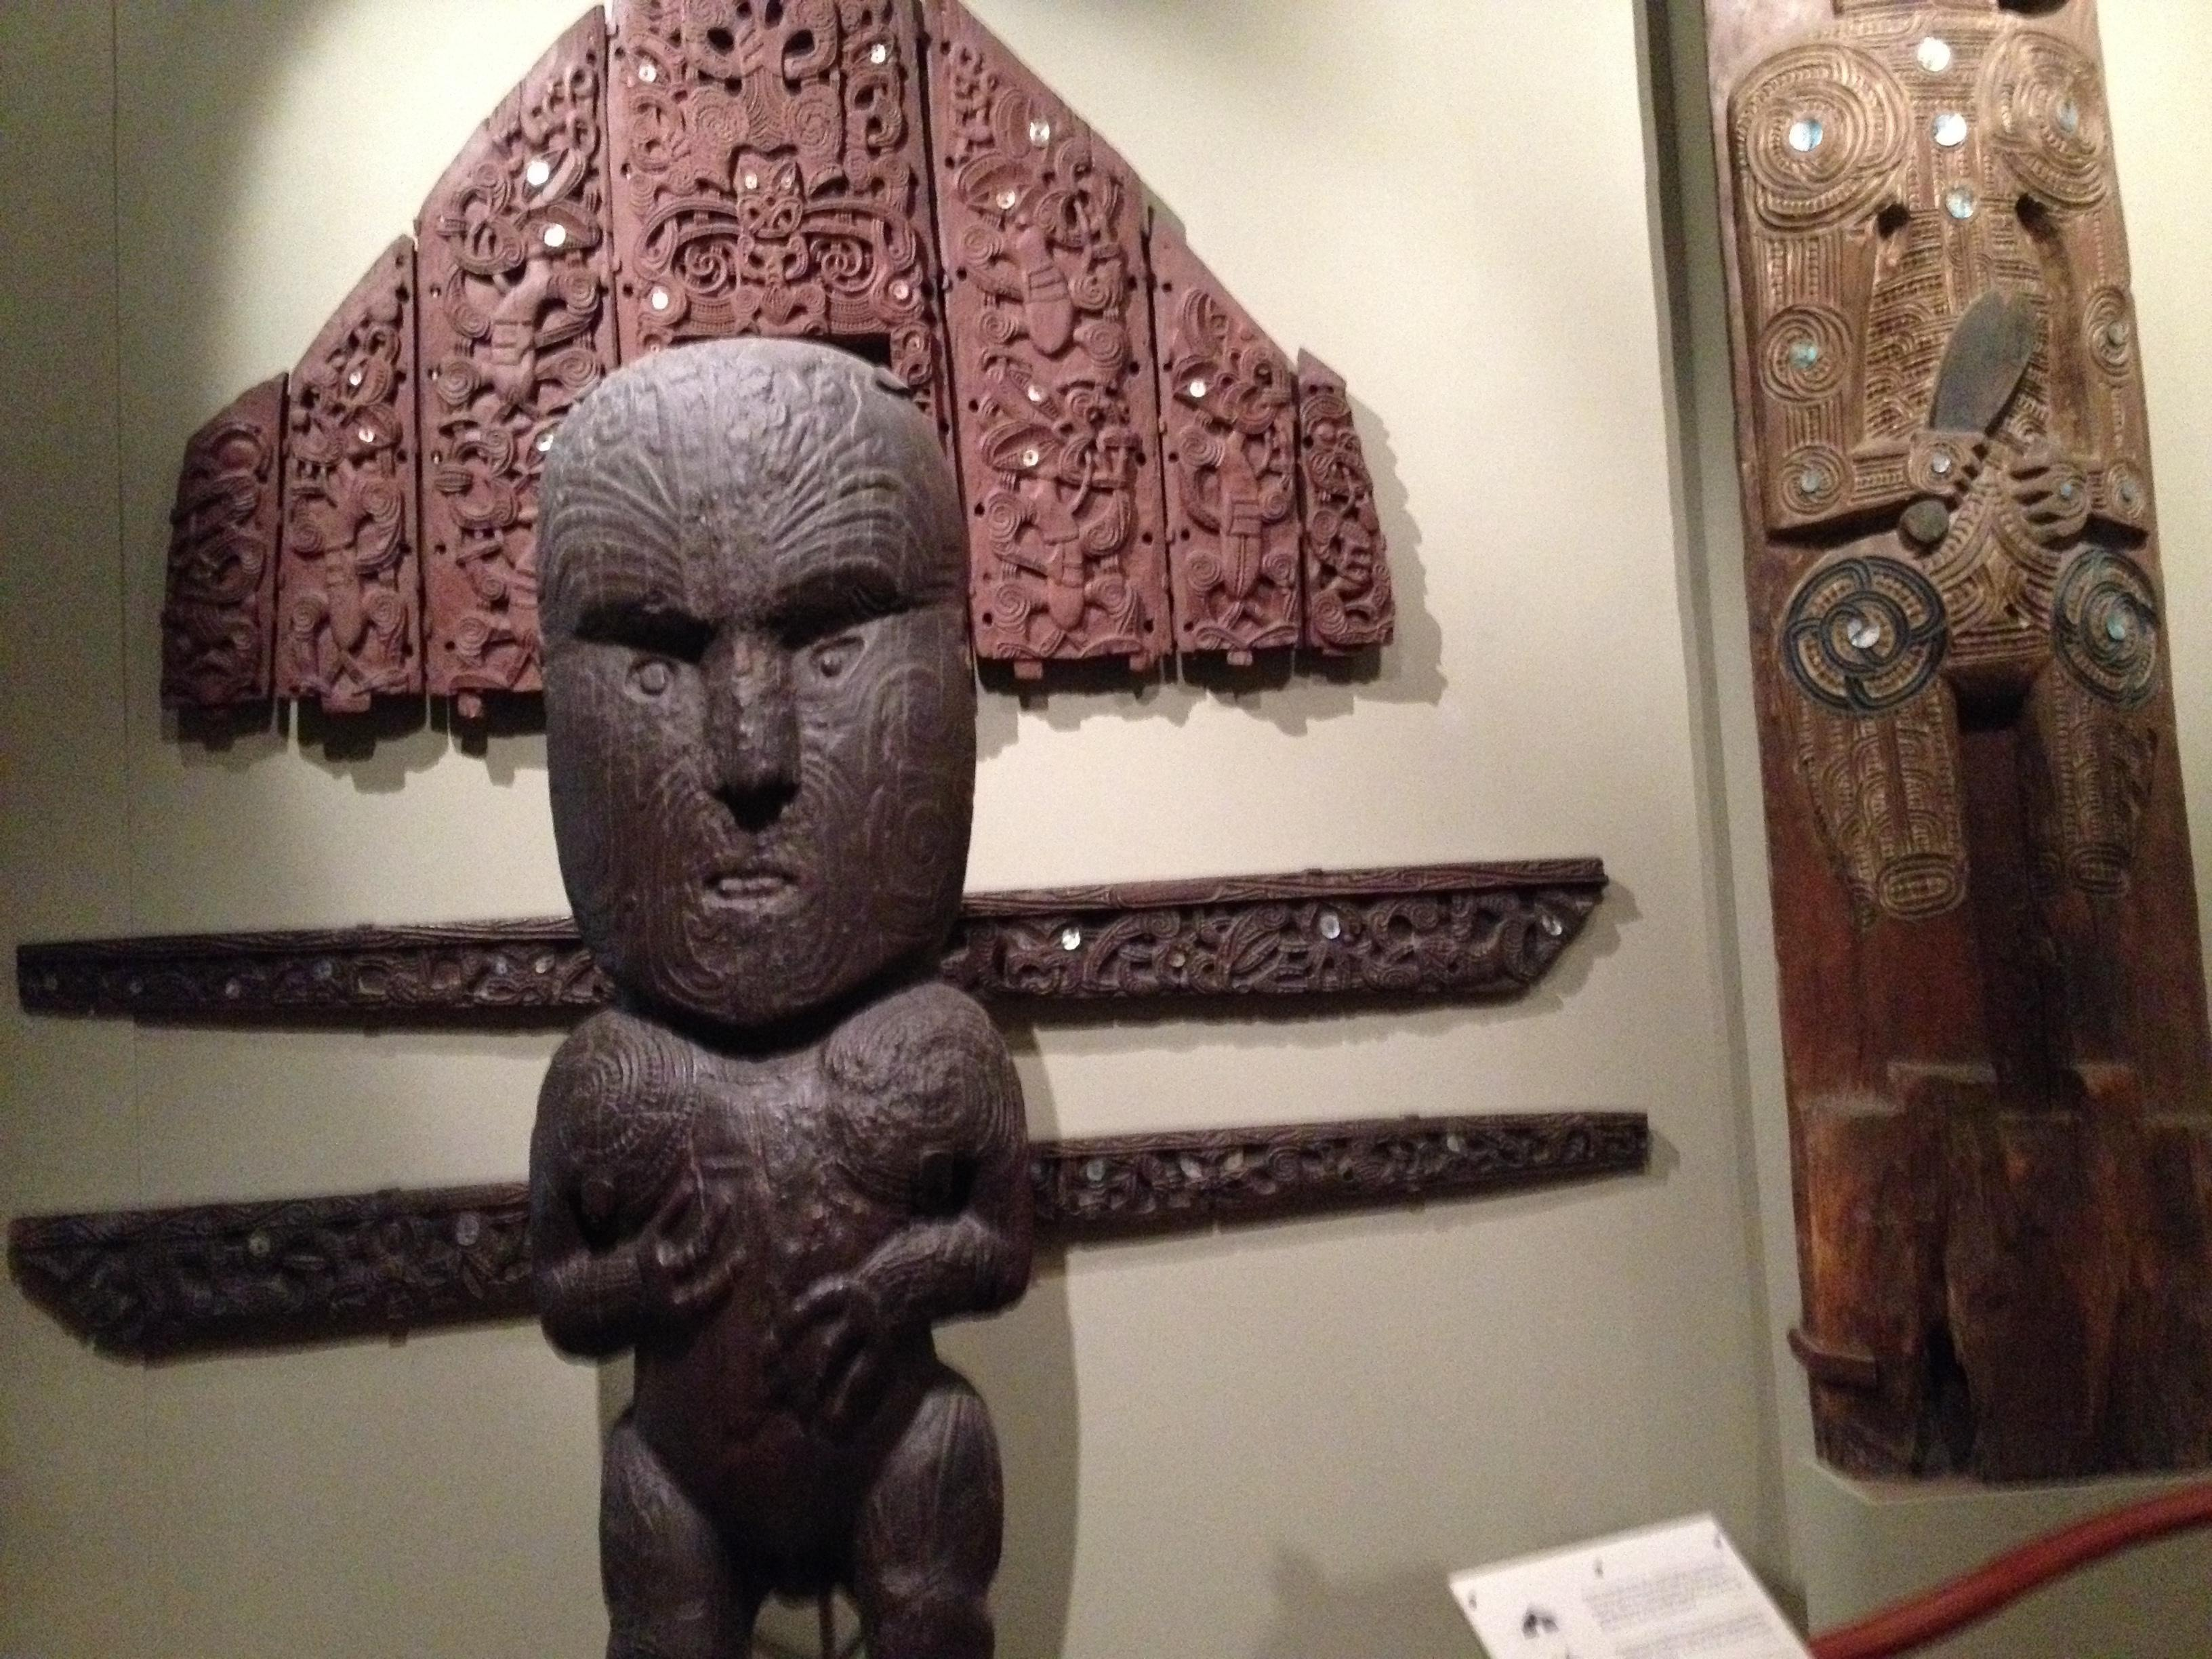 Ways to Experience Maori Culture in Christchurch